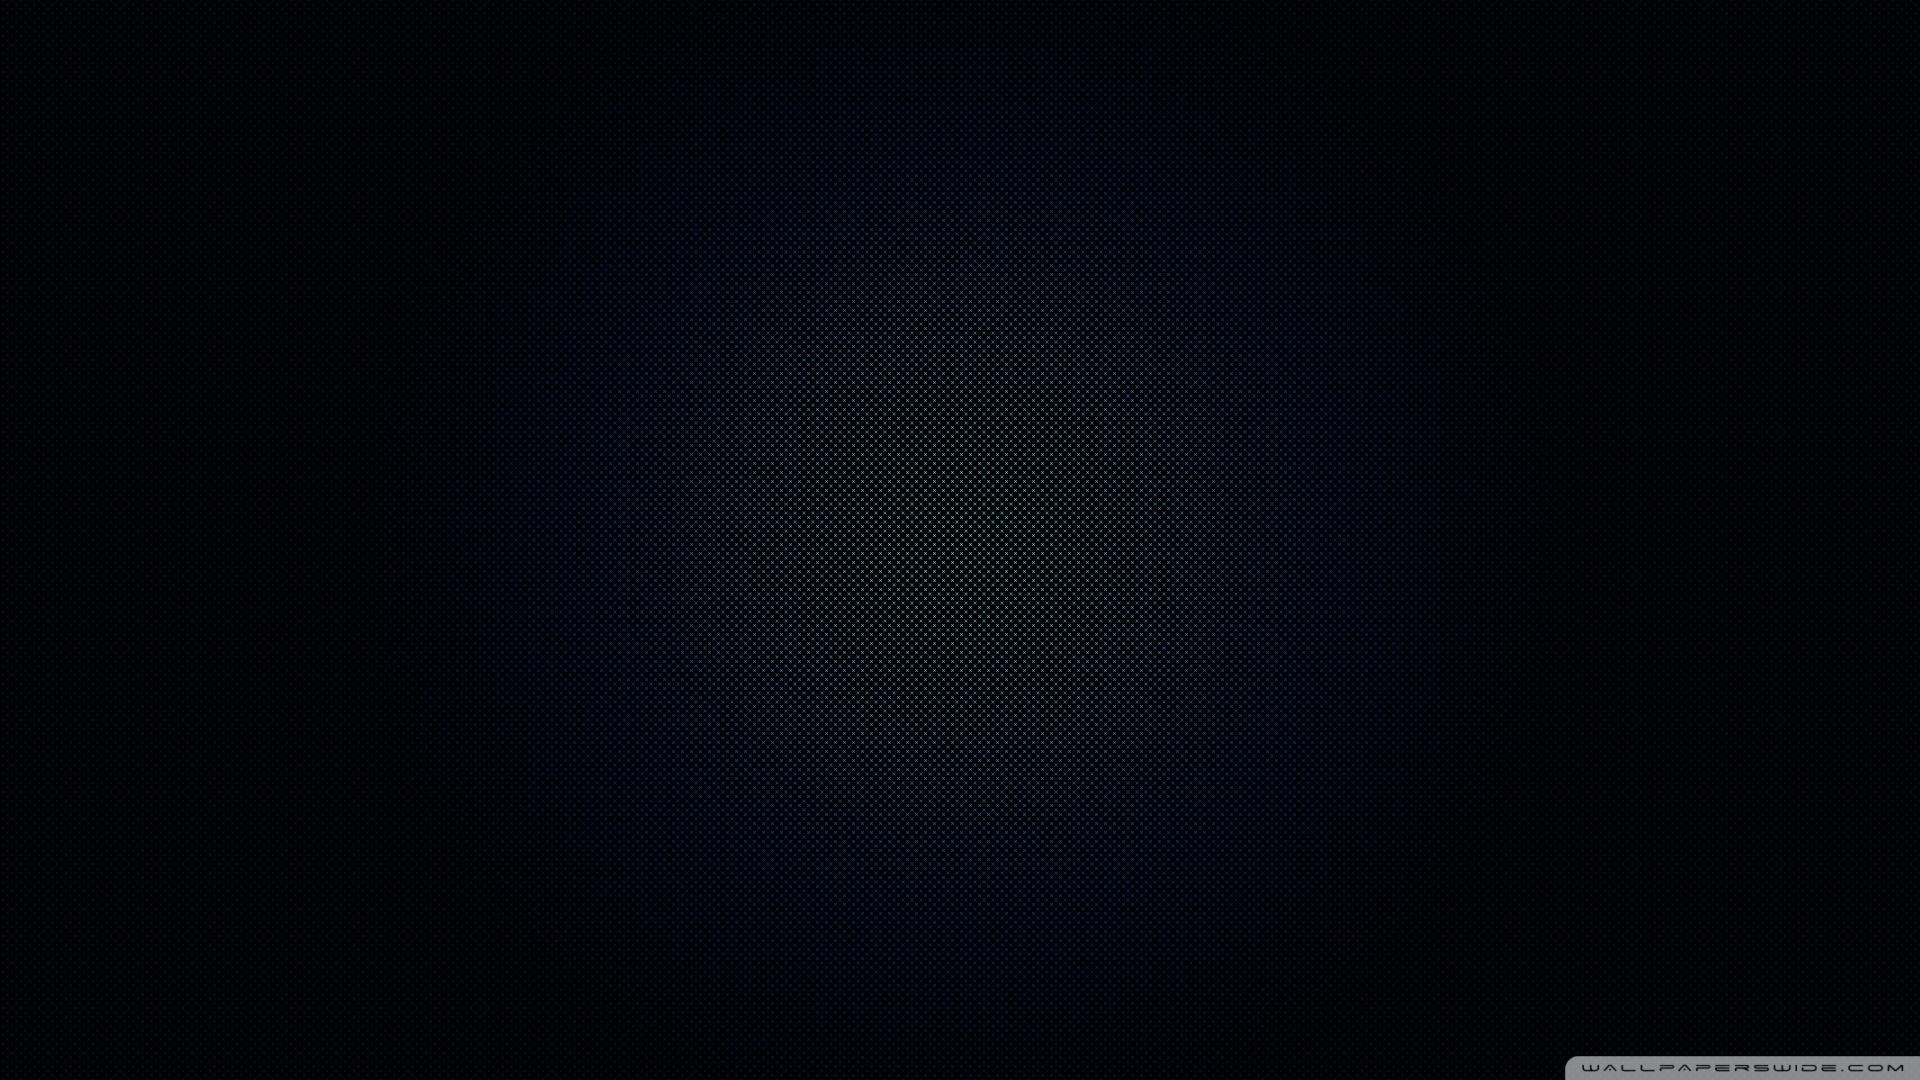 Free Download Black Texture Wallpaper Hd 1920x1080 For Your Desktop Mobile Tablet Explore 73 Black Texture Wallpaper Textured Wallpaper Designs For Walls Textured Wallpaper For Walls Textured Bathroom Wallpaper